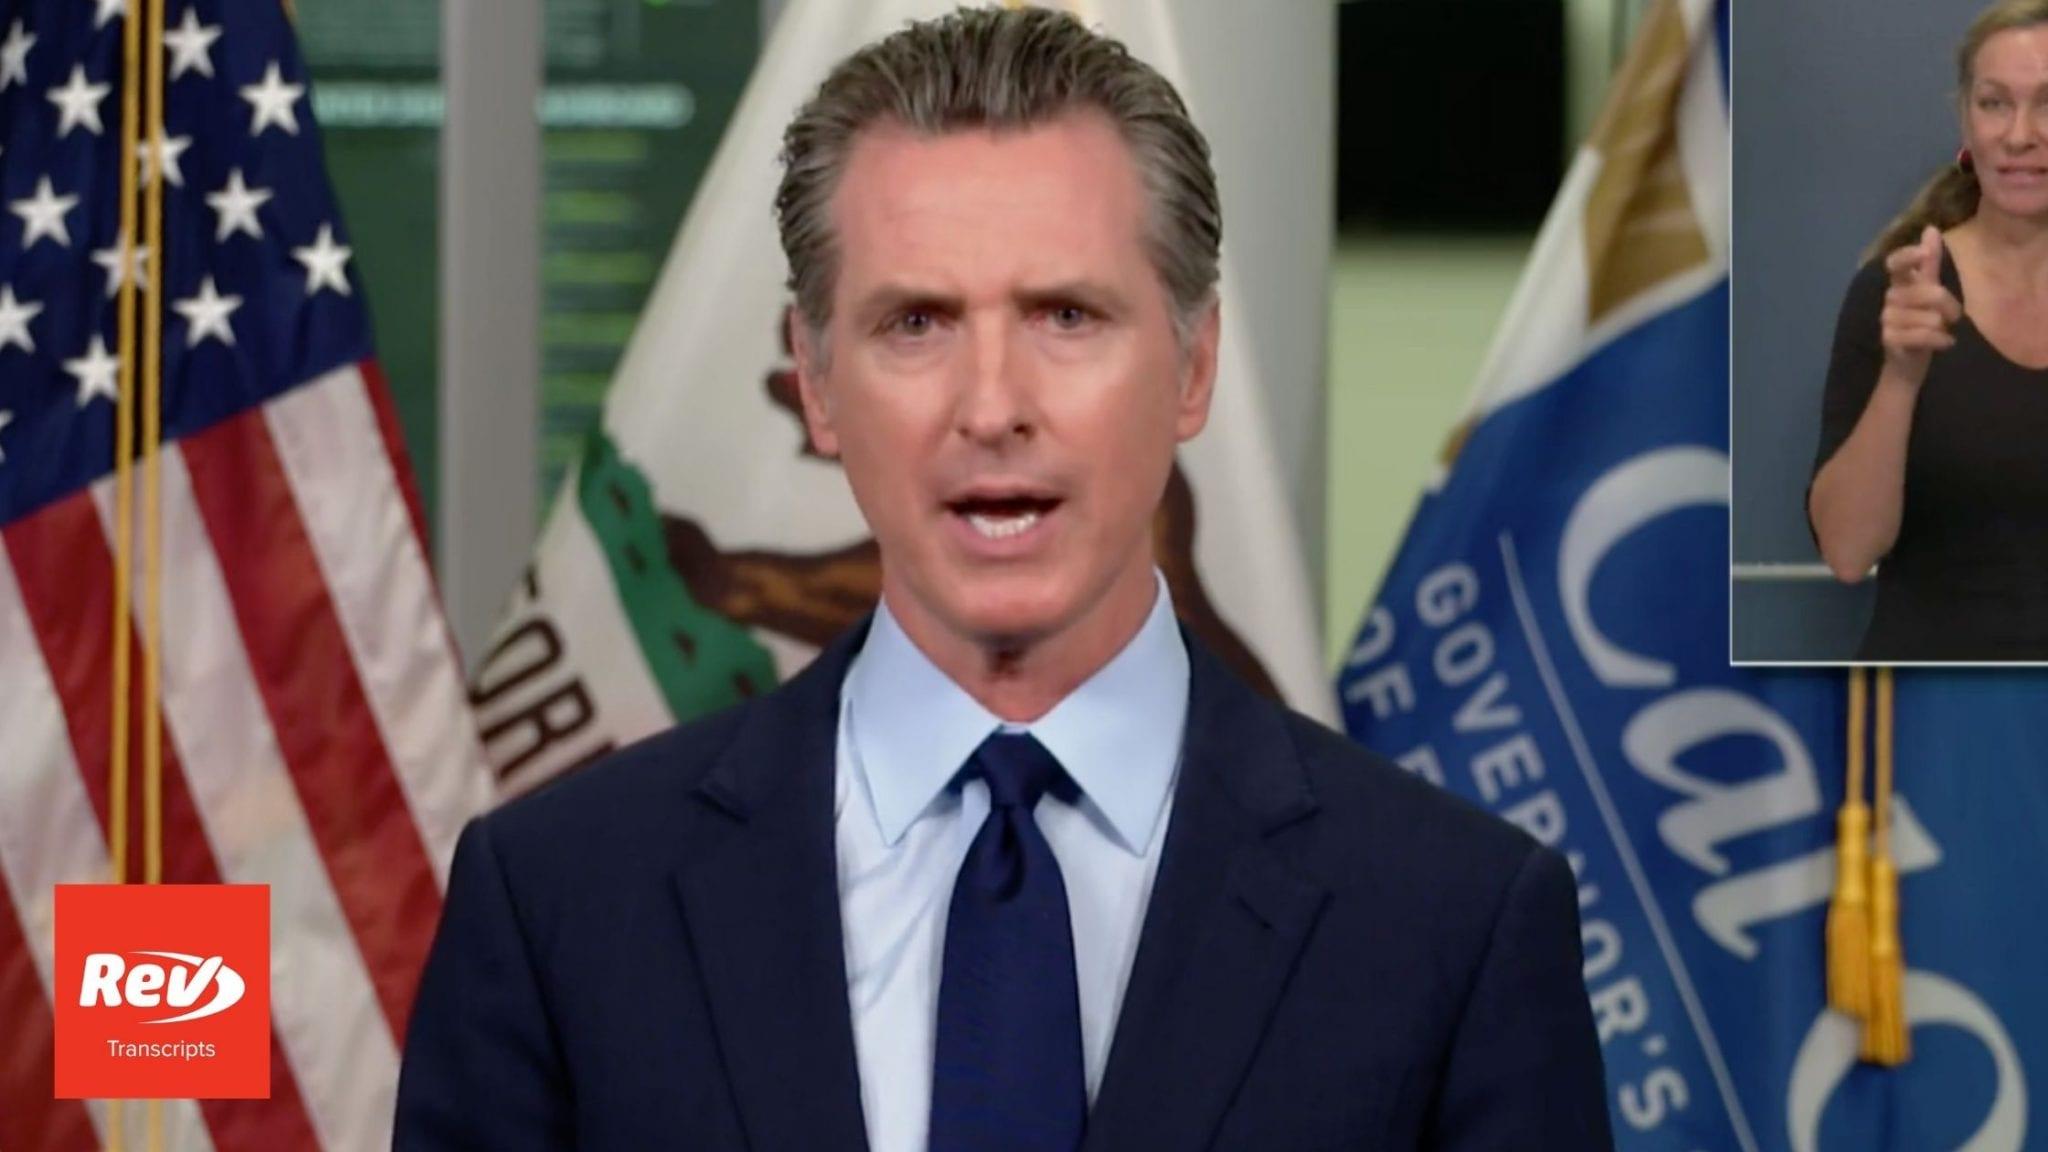 California Governor Gavin Newsom August 24 Press Conference Transcript